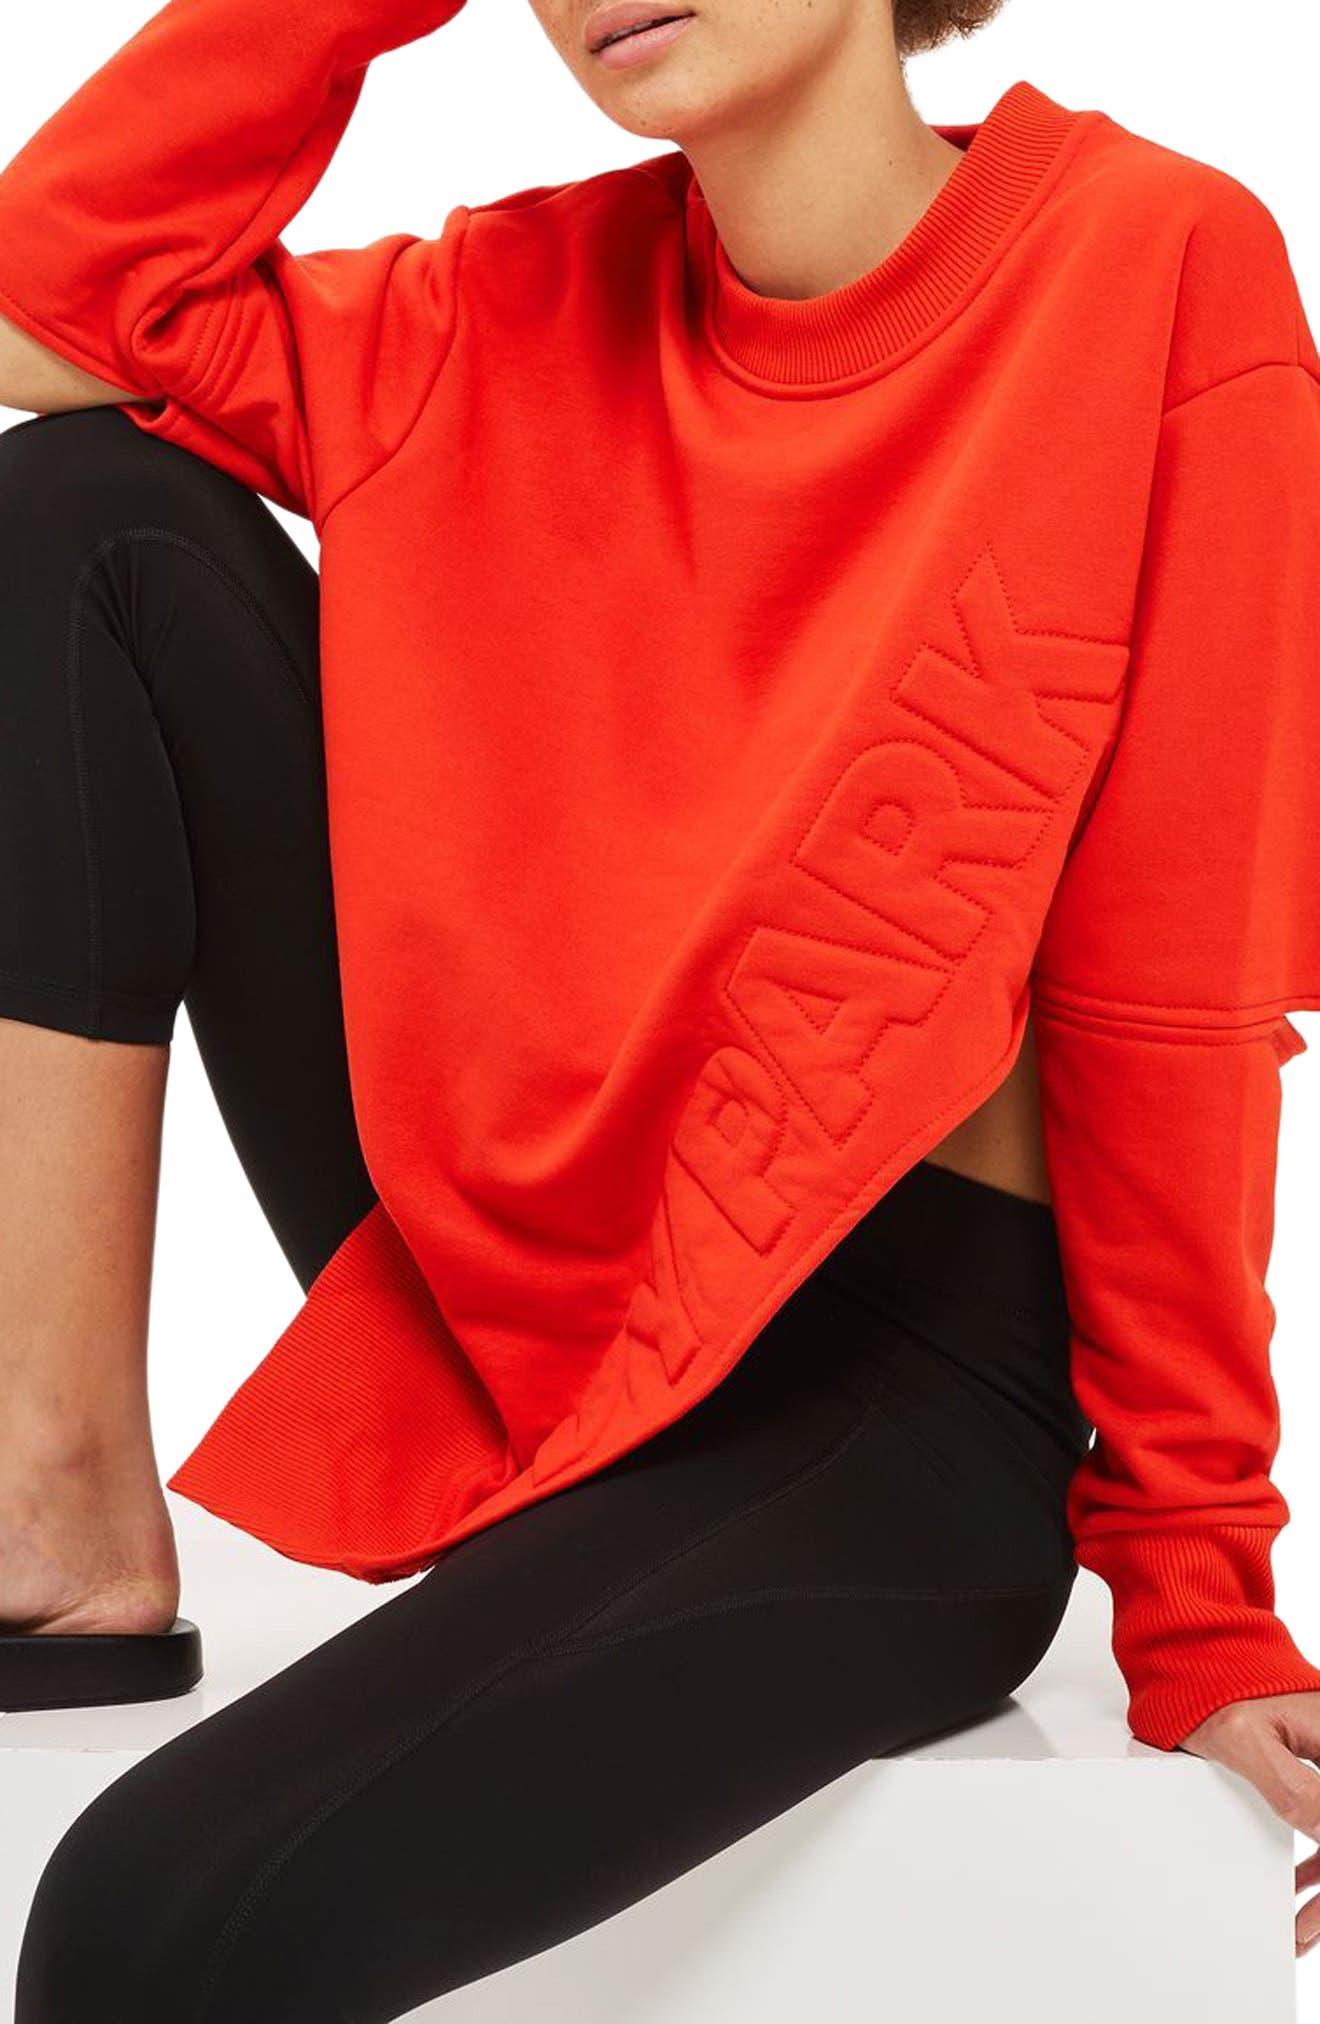 Main Image - IVY PARK® Logo Embossed Sliced Sweatshirt